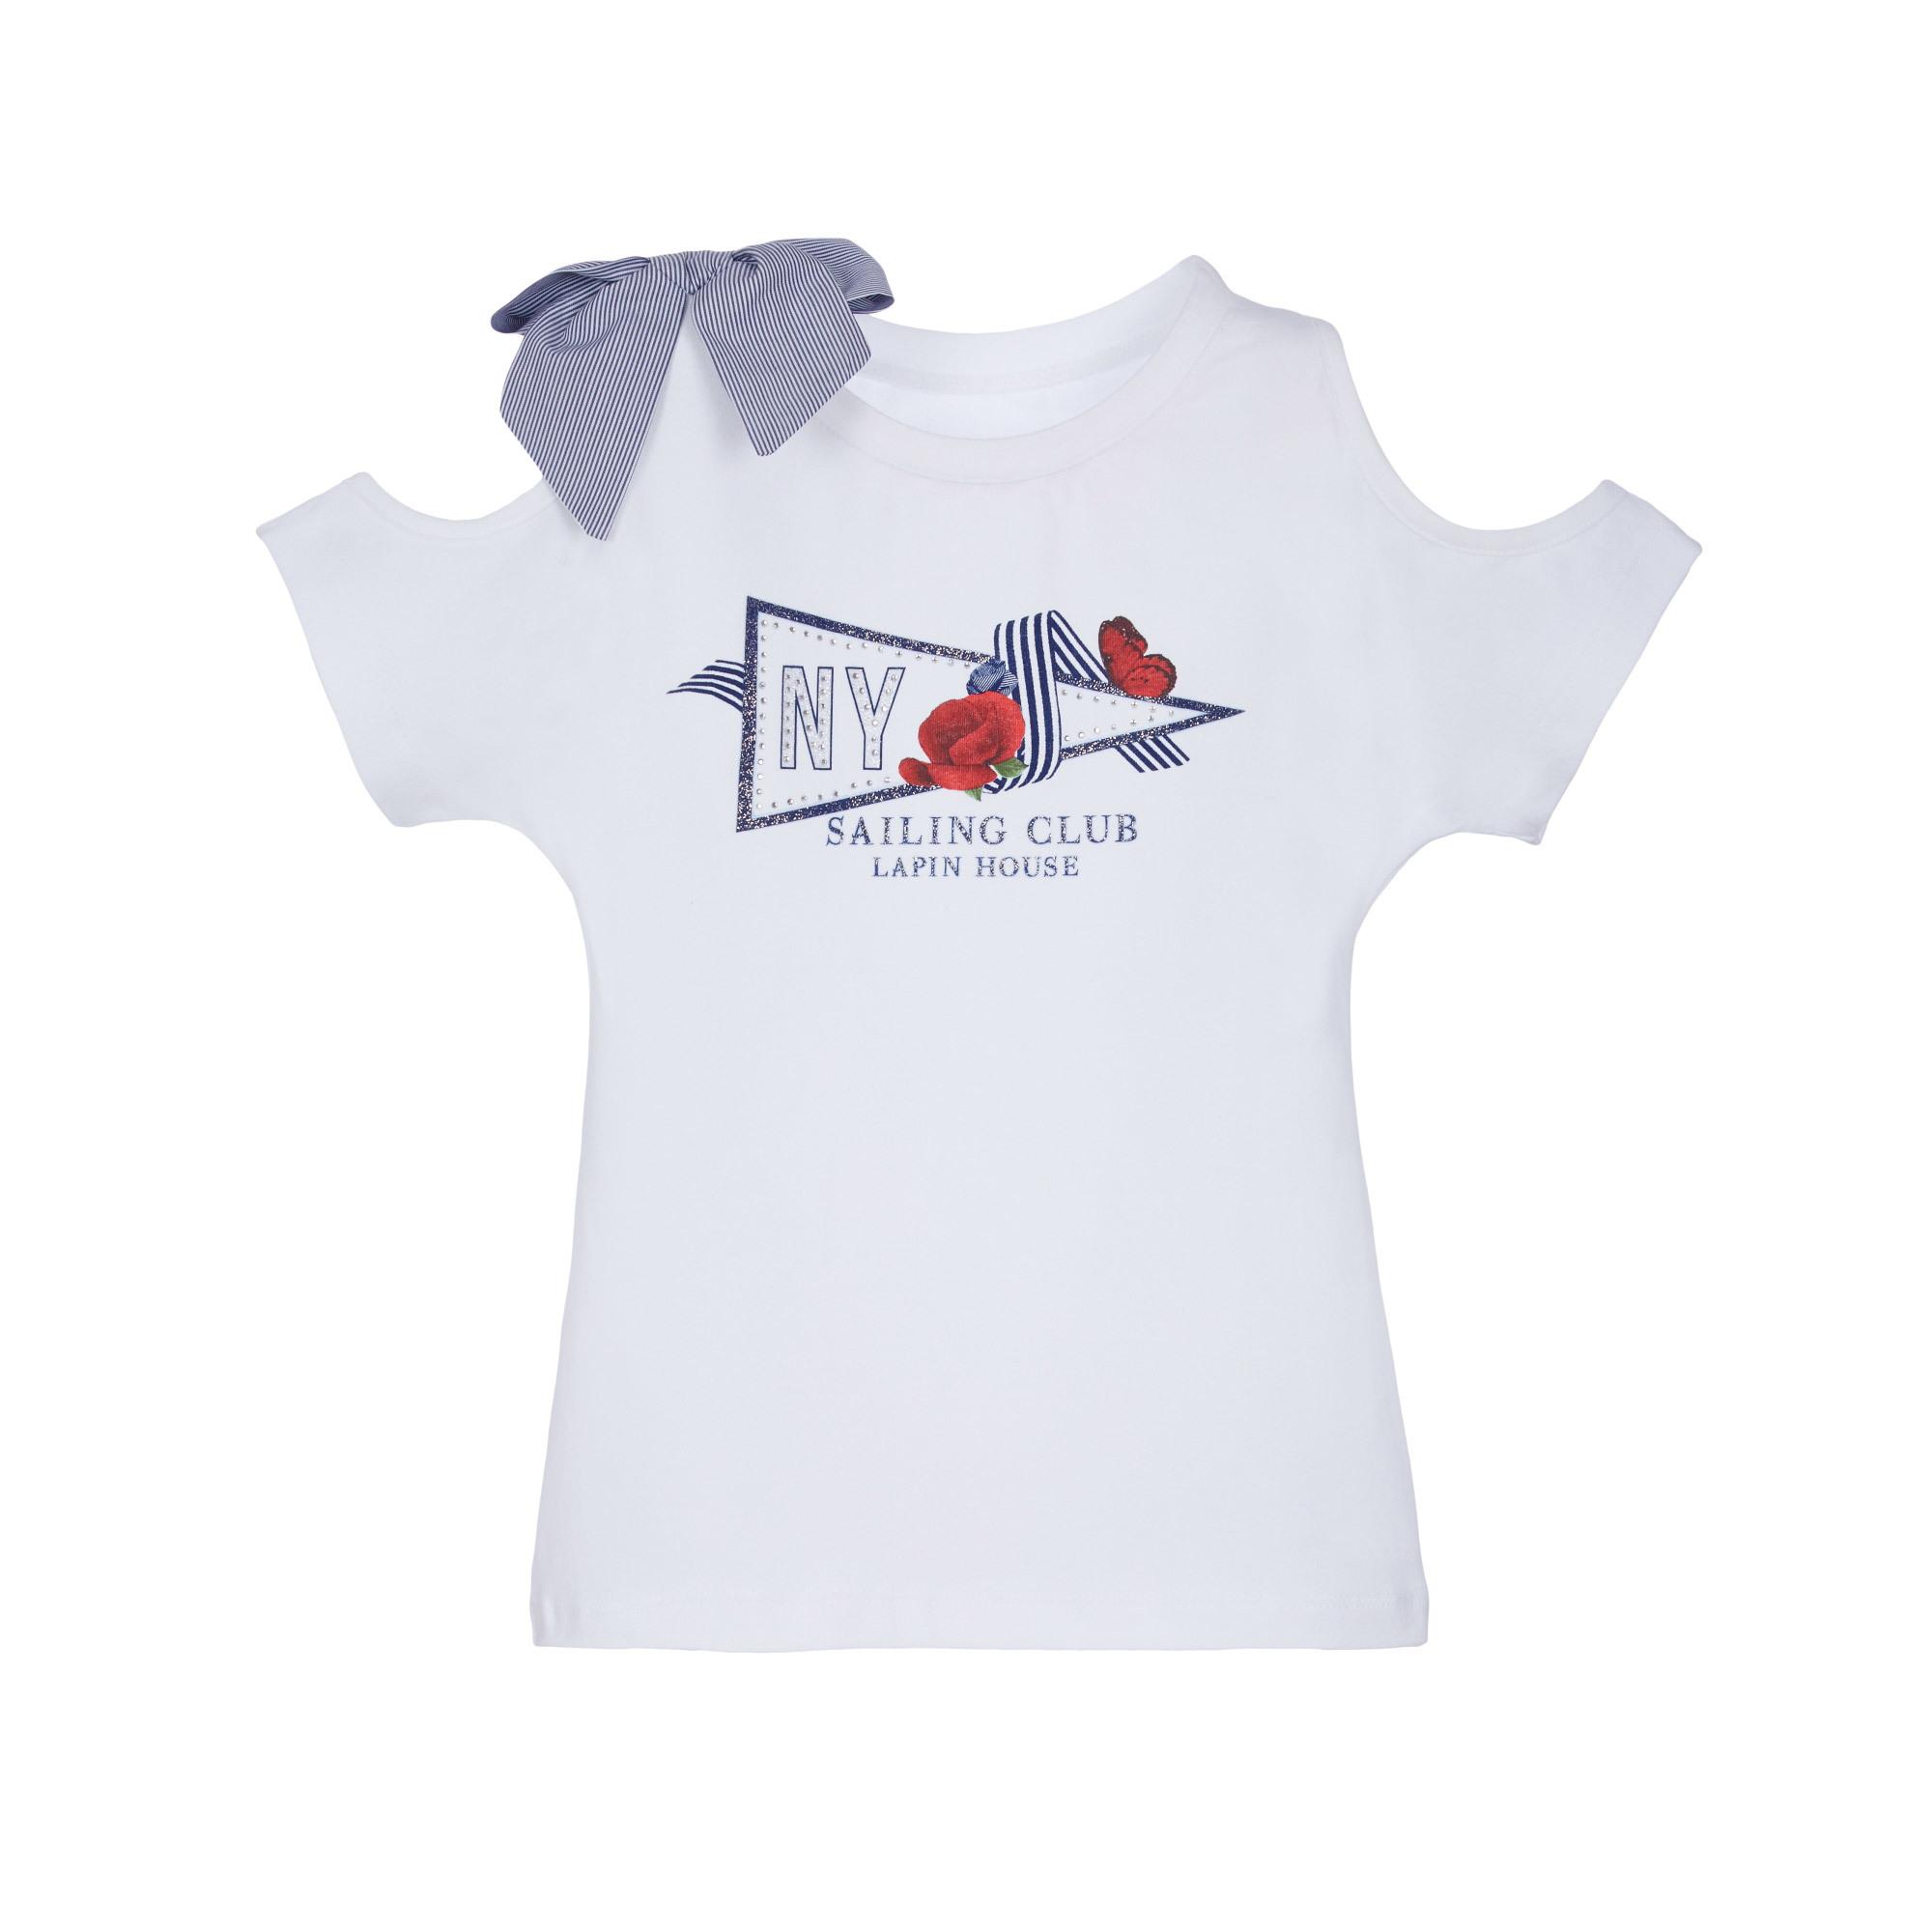 b17e4bda2d3 Παιδικά Ρούχα - Lapin House